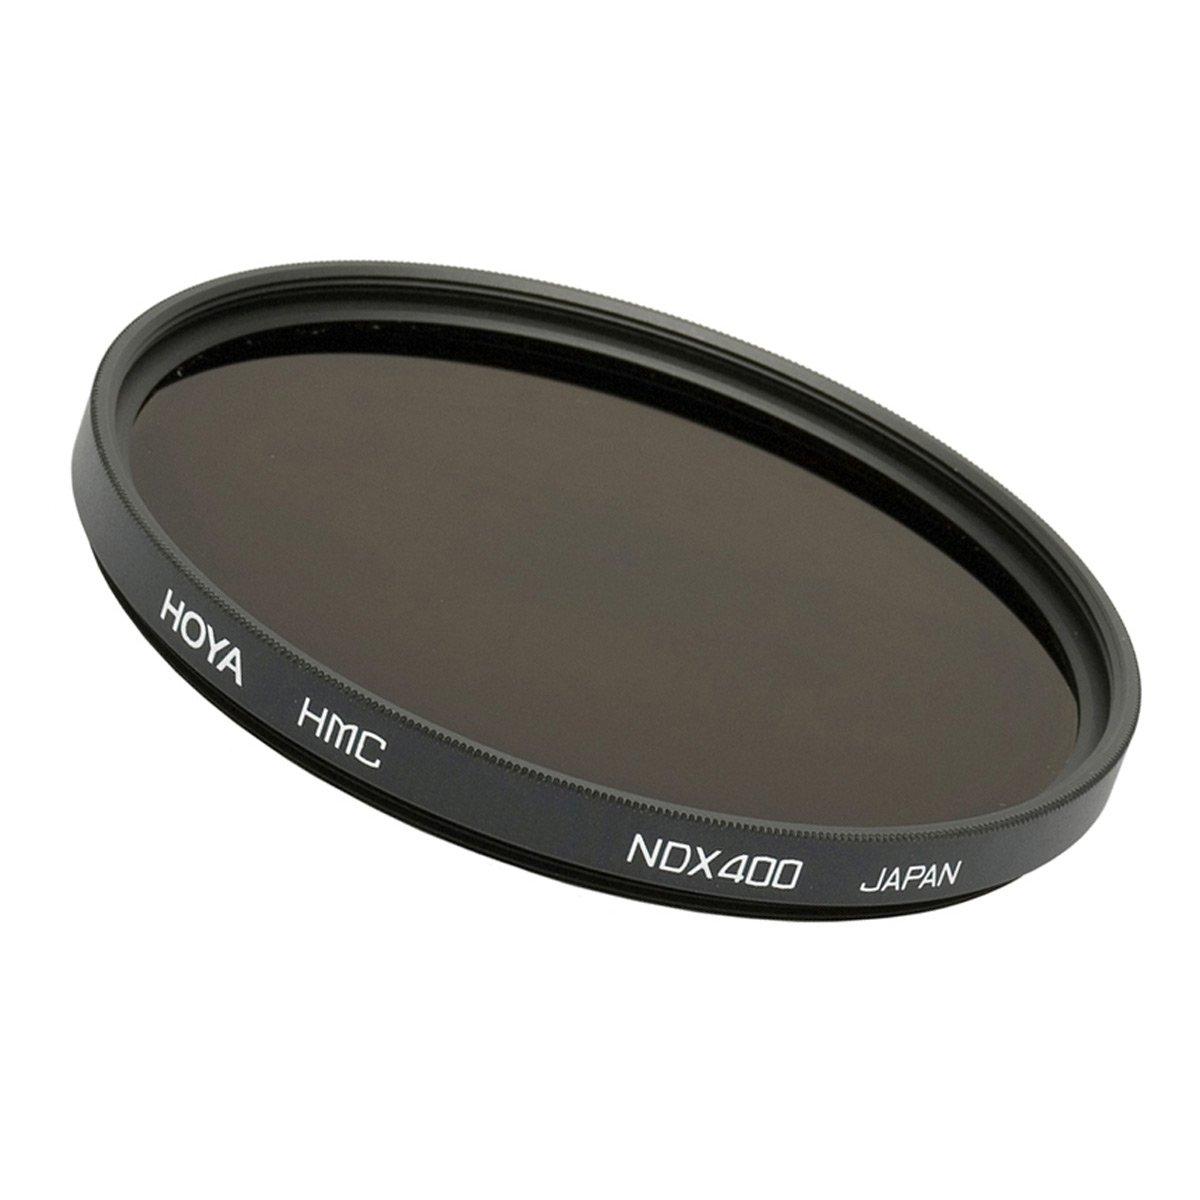 Hoya 49mm Neutral Density ND-400 X, 9 Stop Multi-Coated Glass Filter